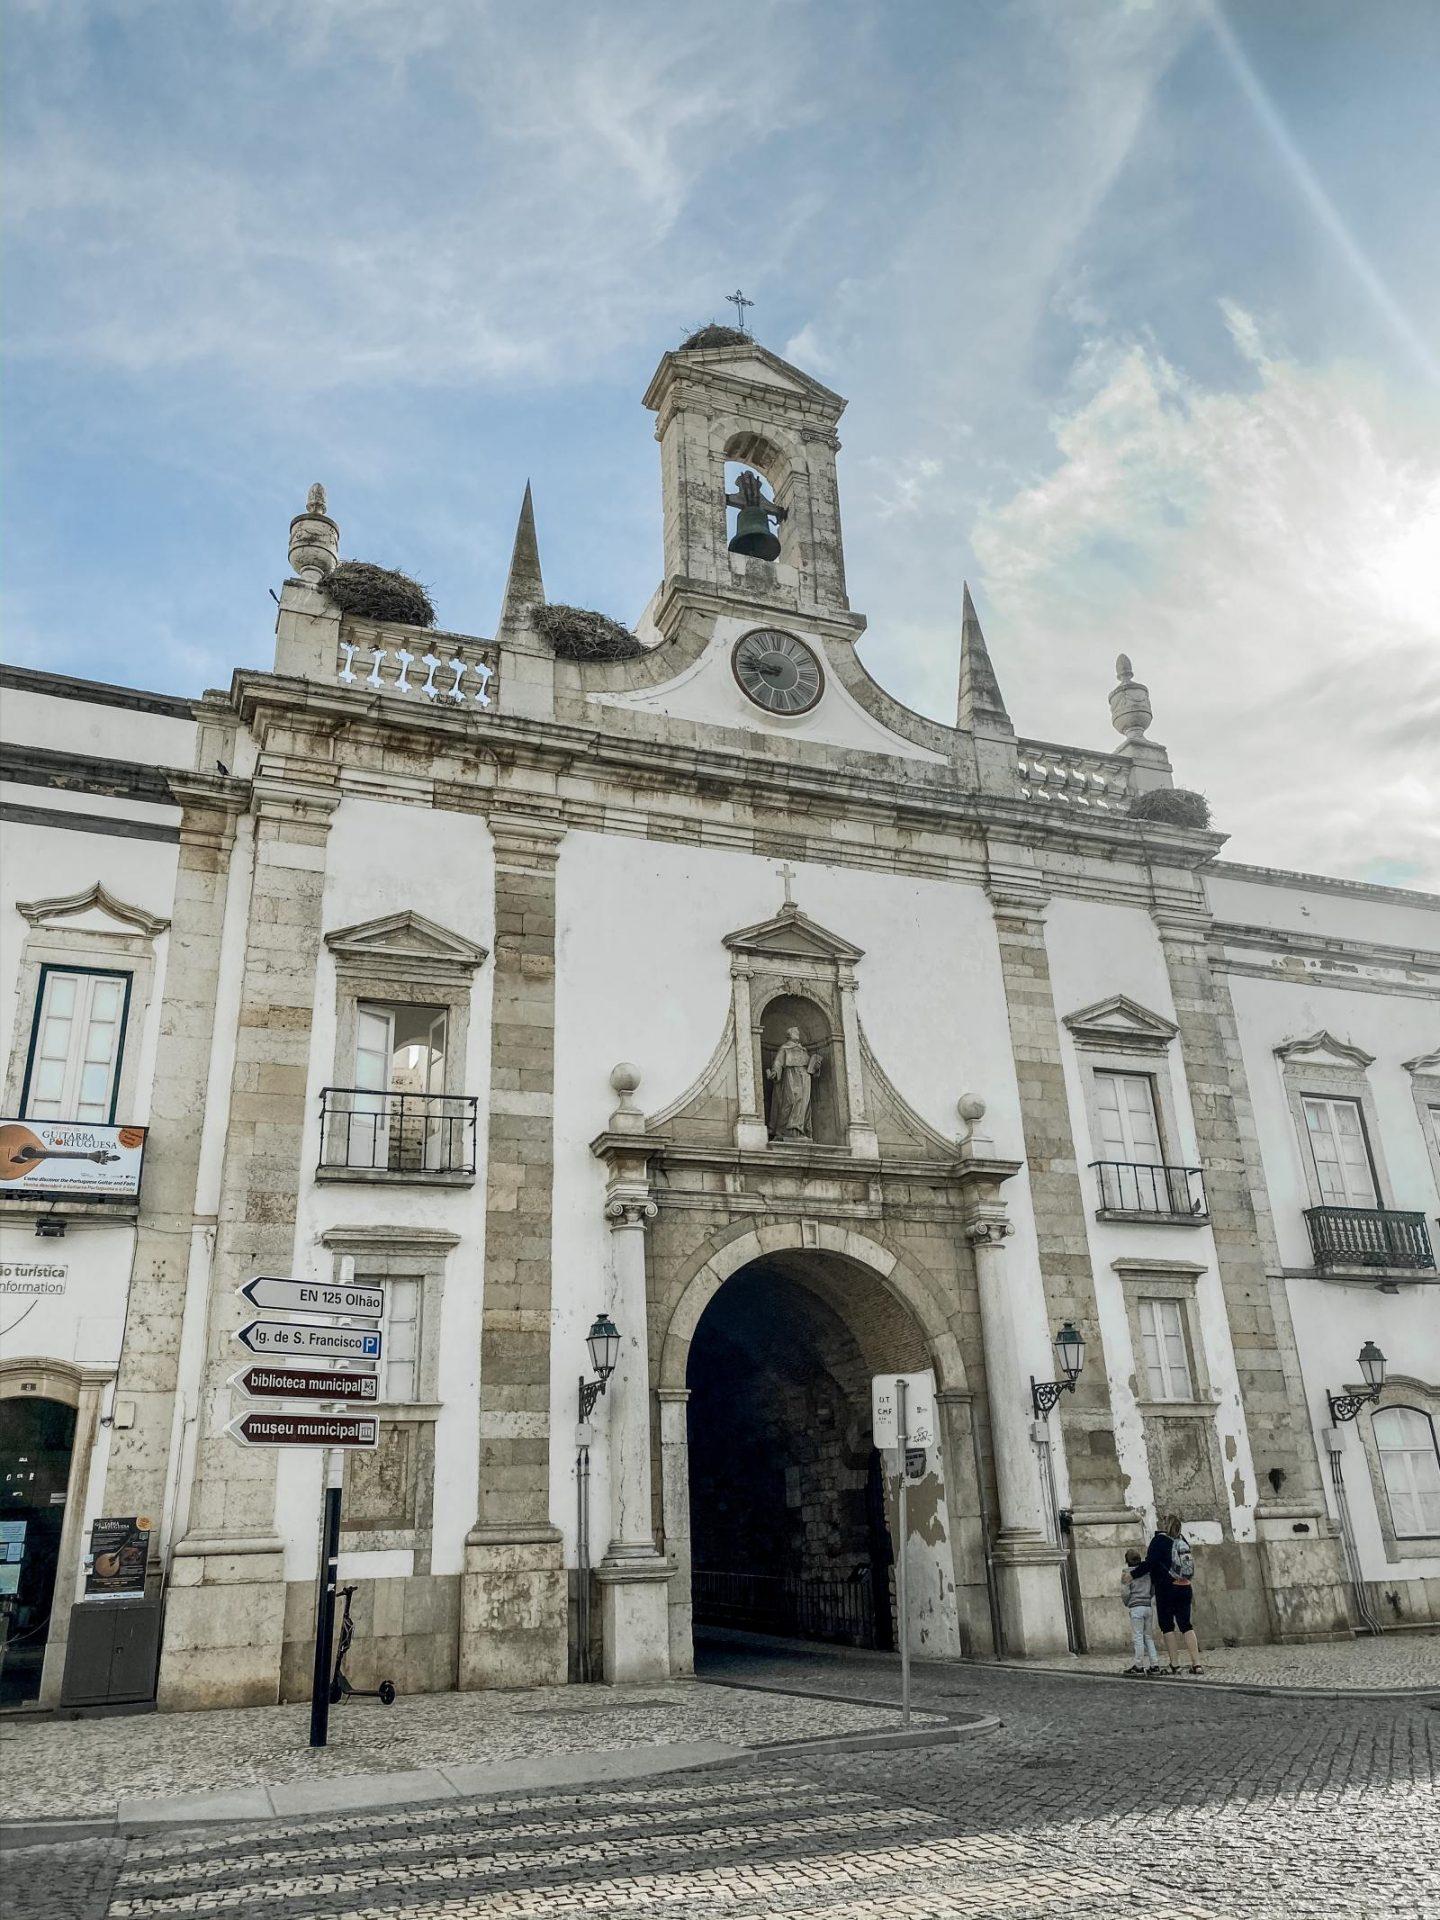 Algarve guide: Faro